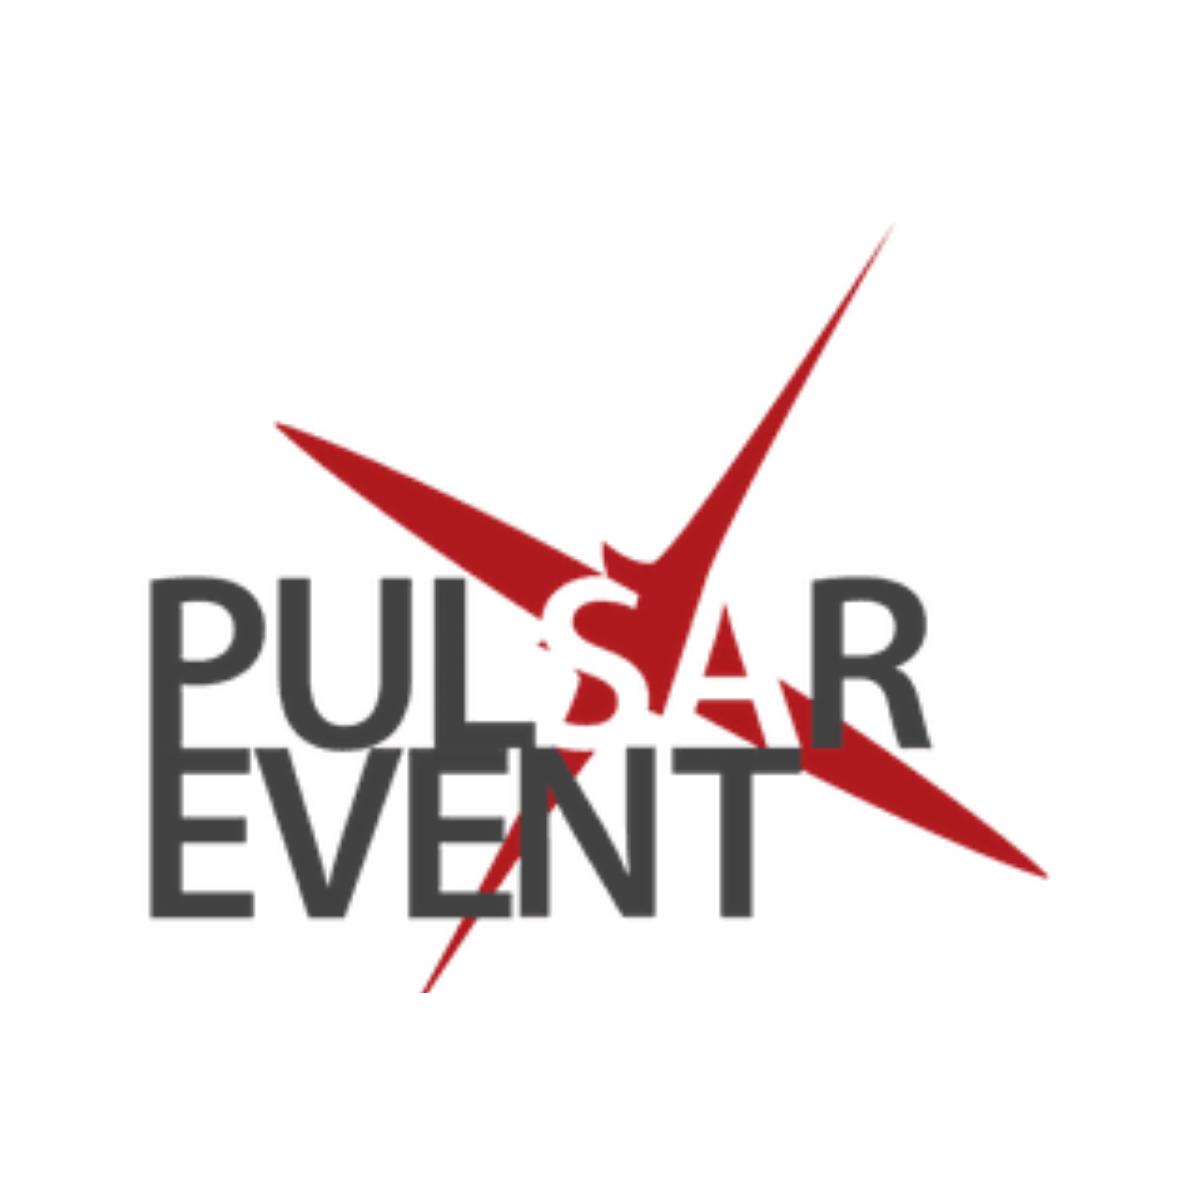 Pulsar Event Logo